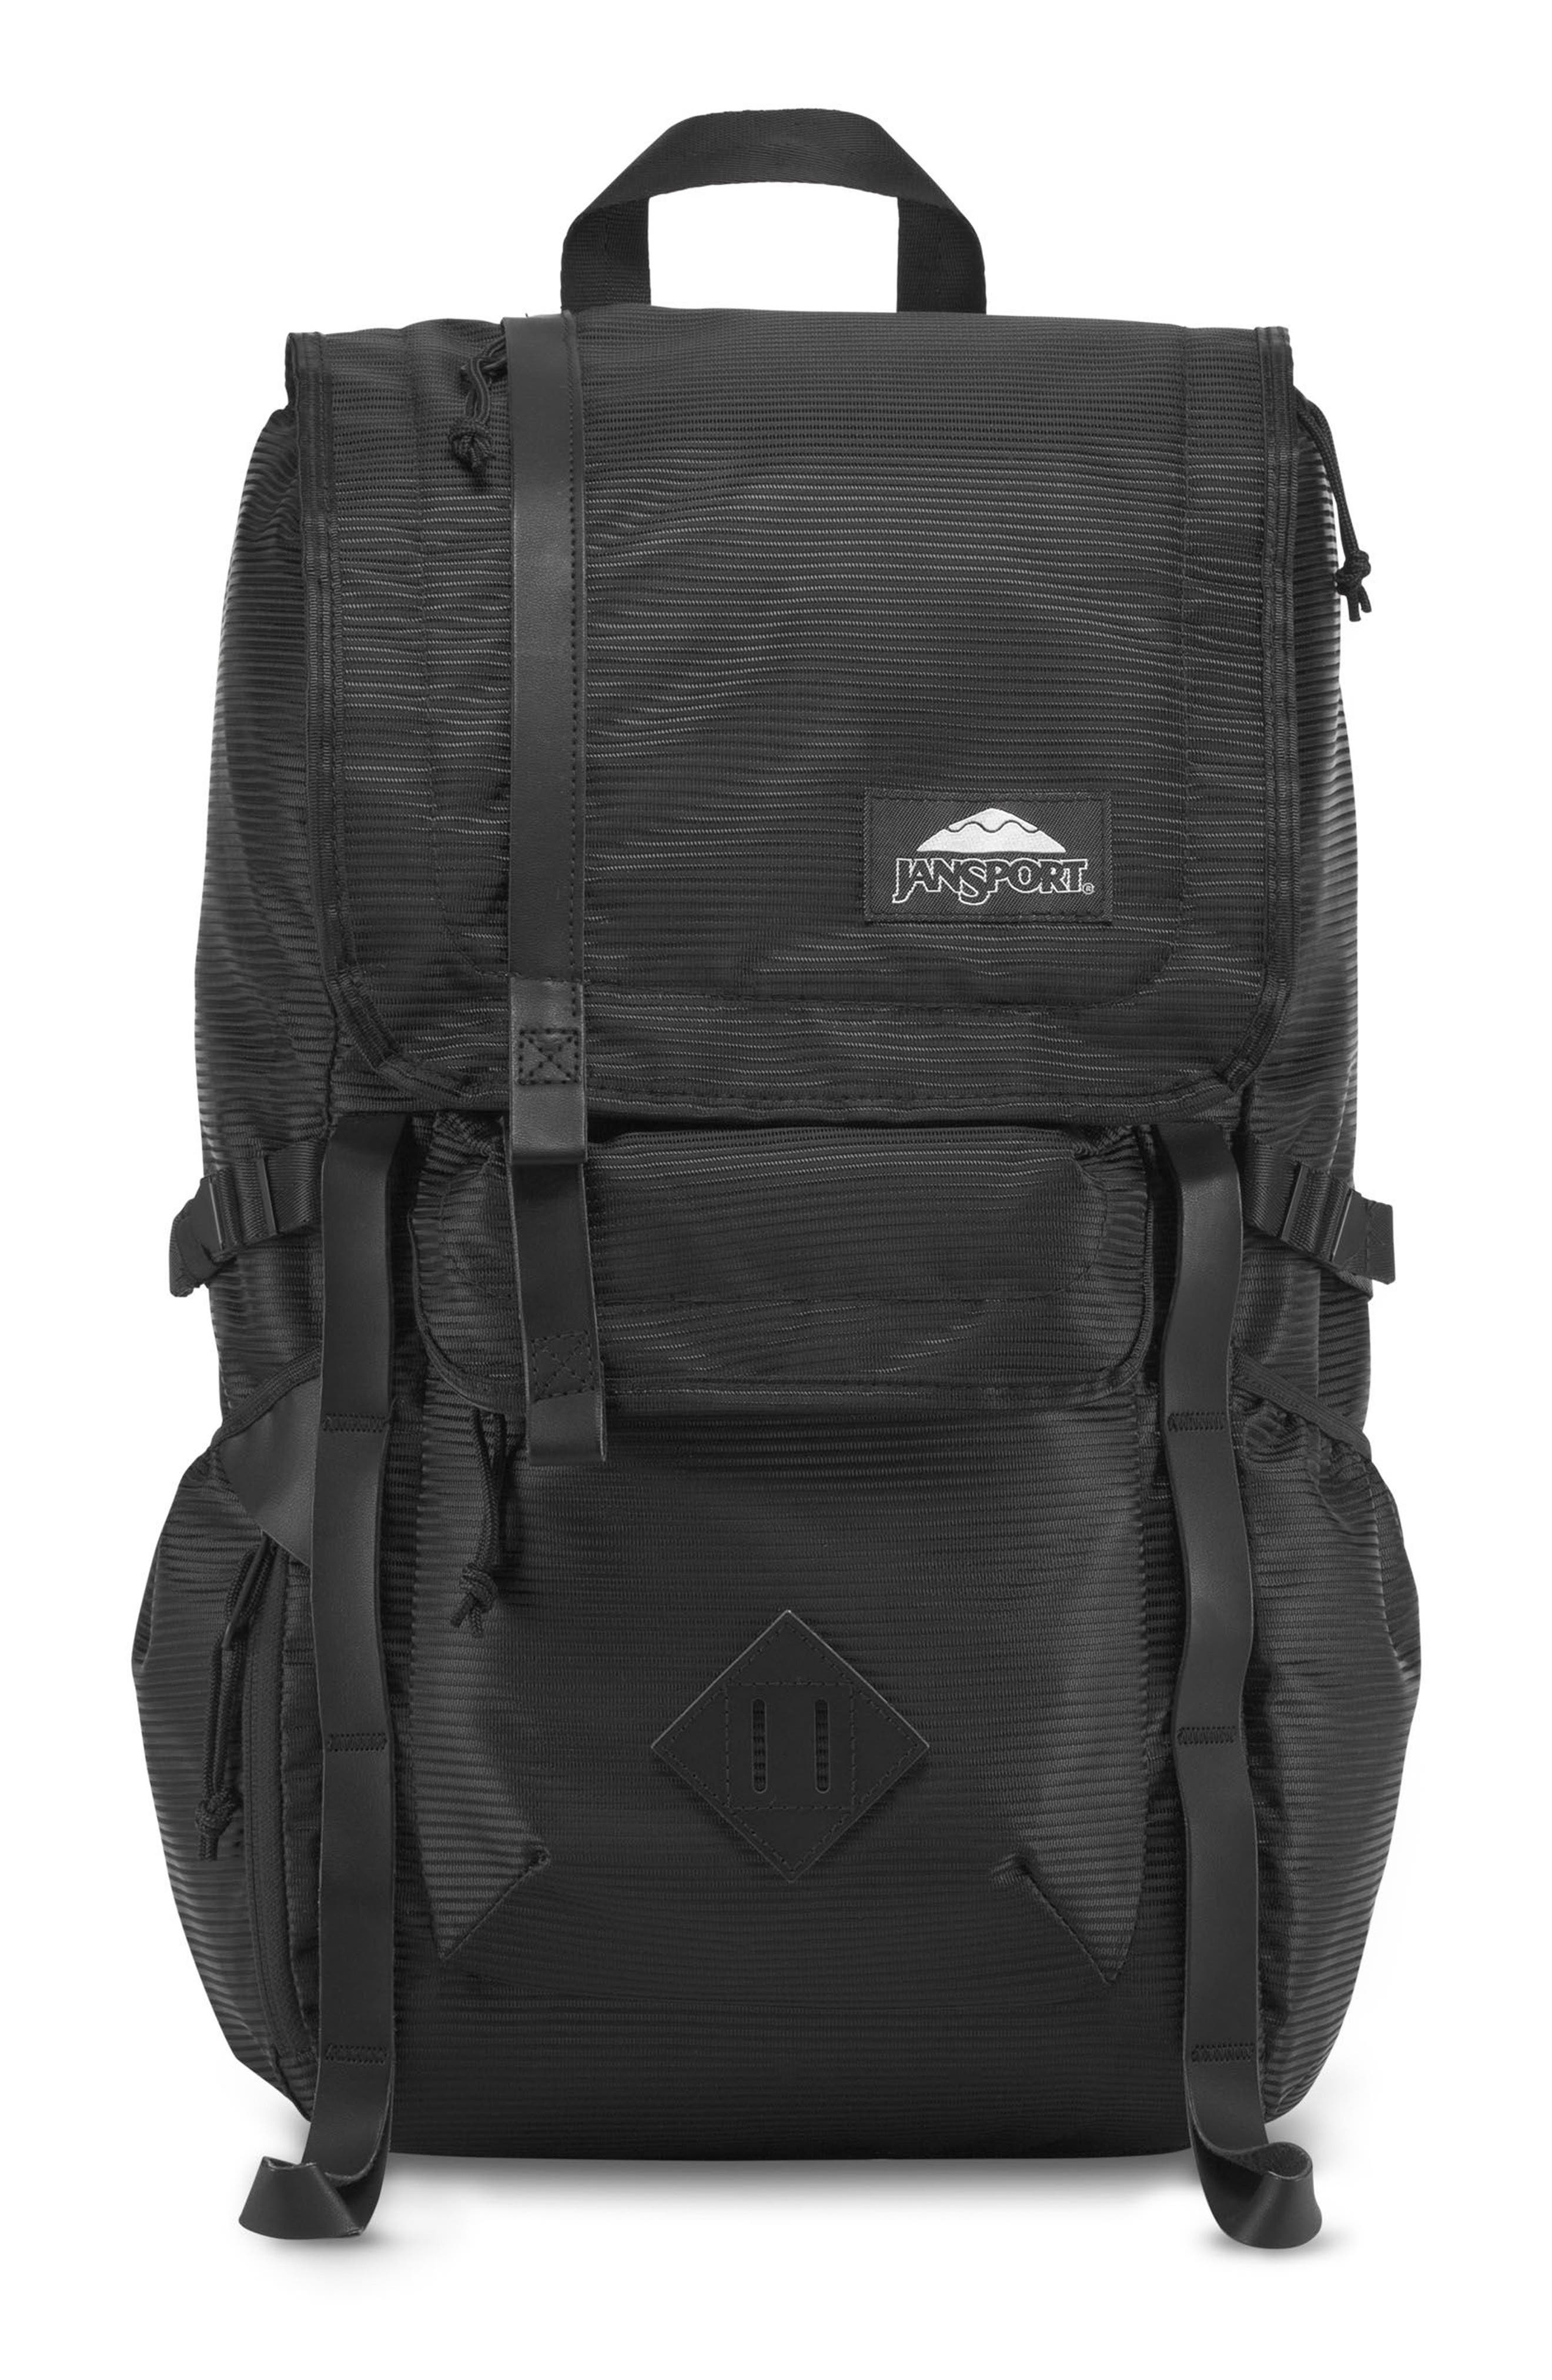 Hatchet DL Backpack,                             Main thumbnail 1, color,                             Black Line